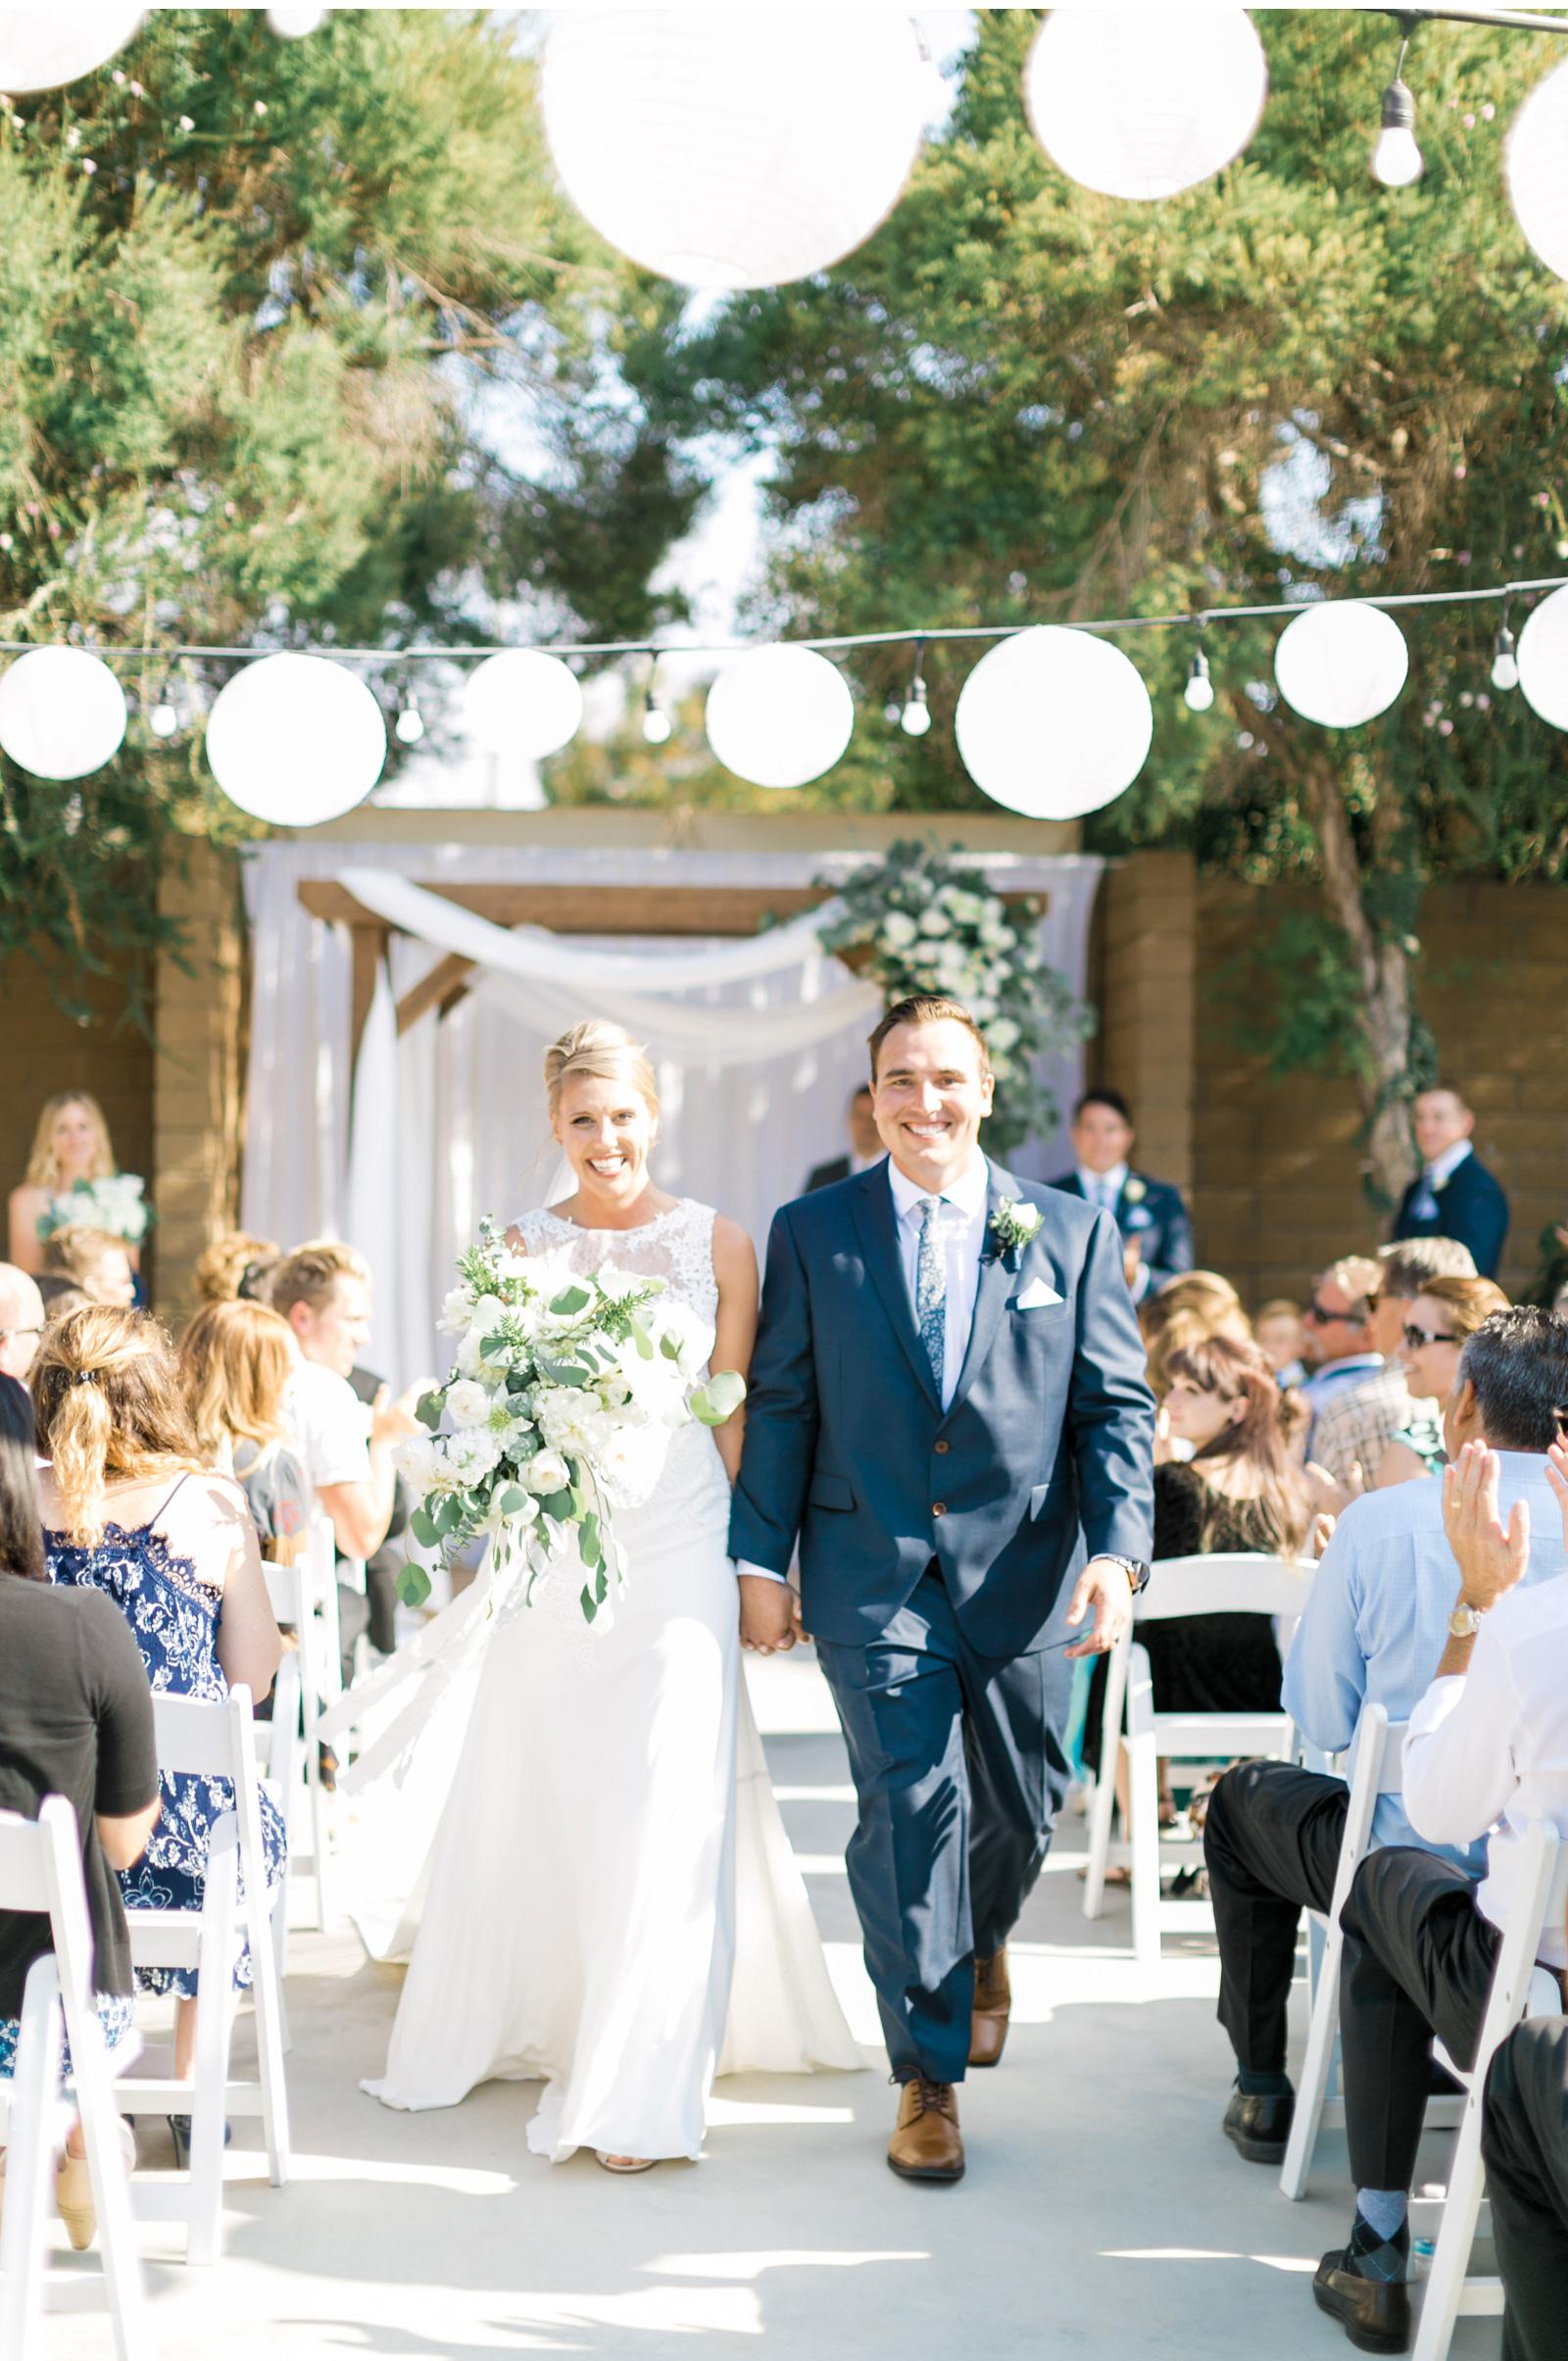 San-Luis-Obispo-Wedding-Photographer-Natalie-Schutt-Photography-Style-Me-Pretty_09.jpg